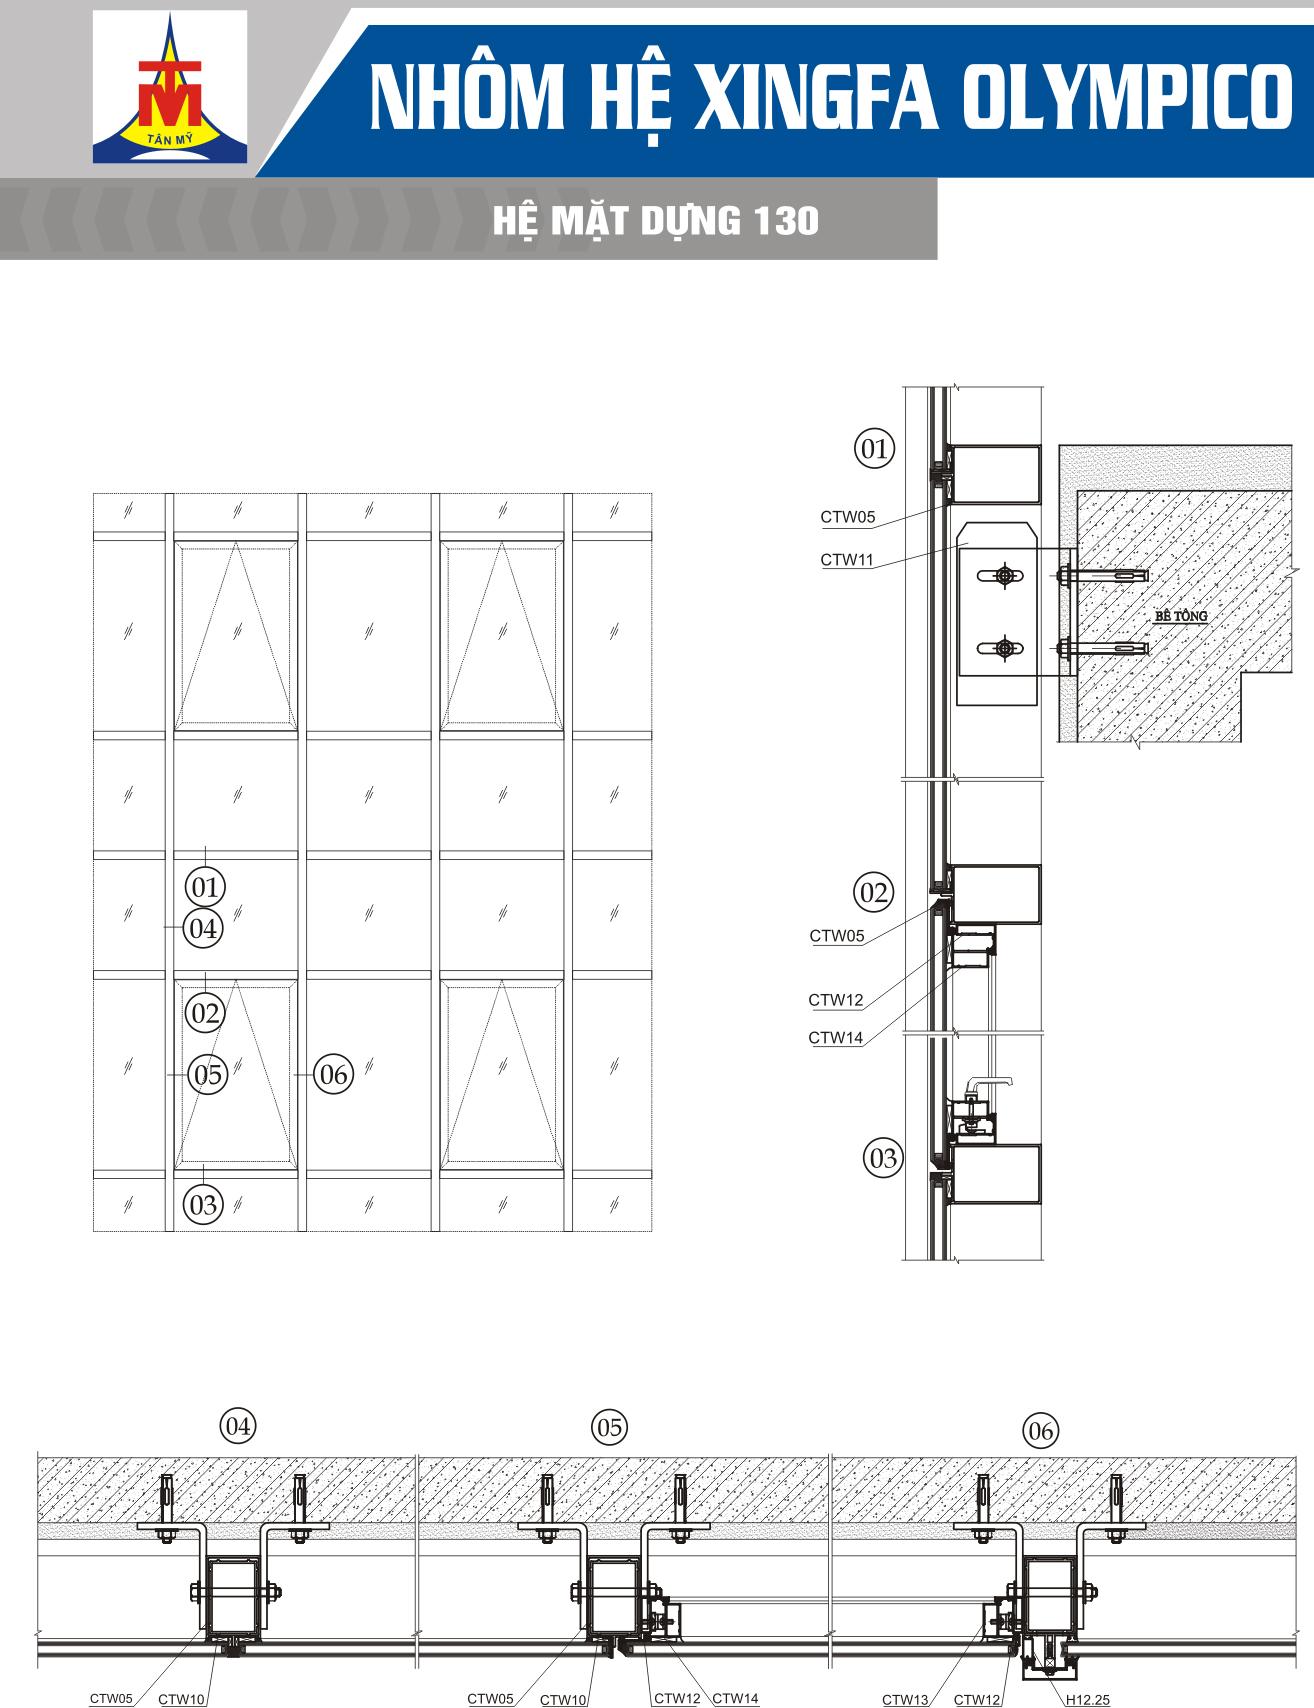 nhom-xingfa-olympico-02